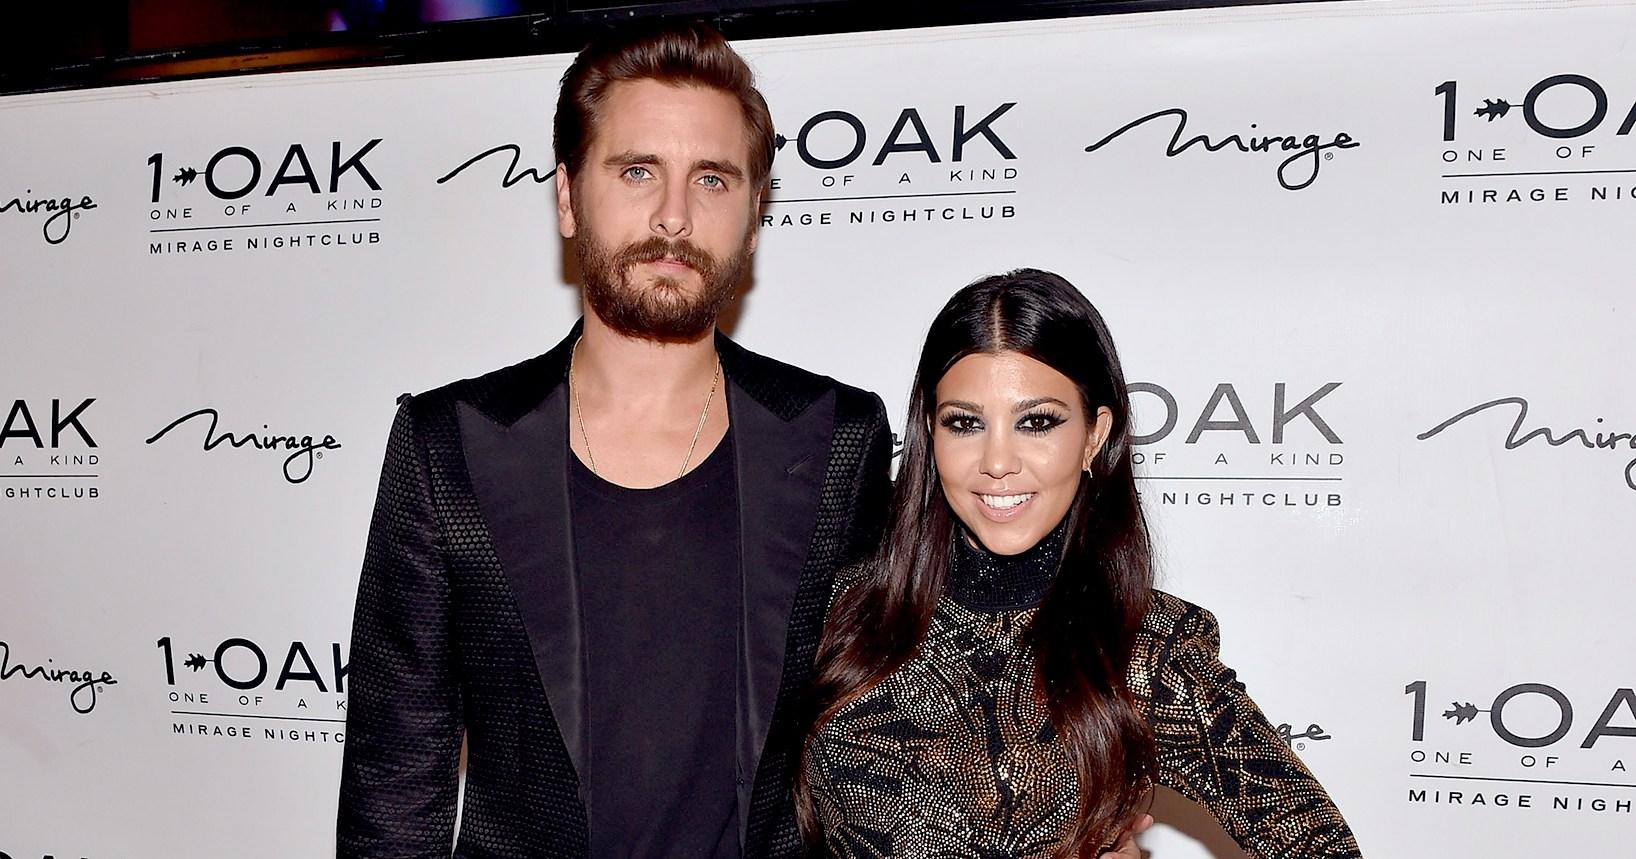 Kourtney Kardashian, Scott Disick Talk About Coparenting